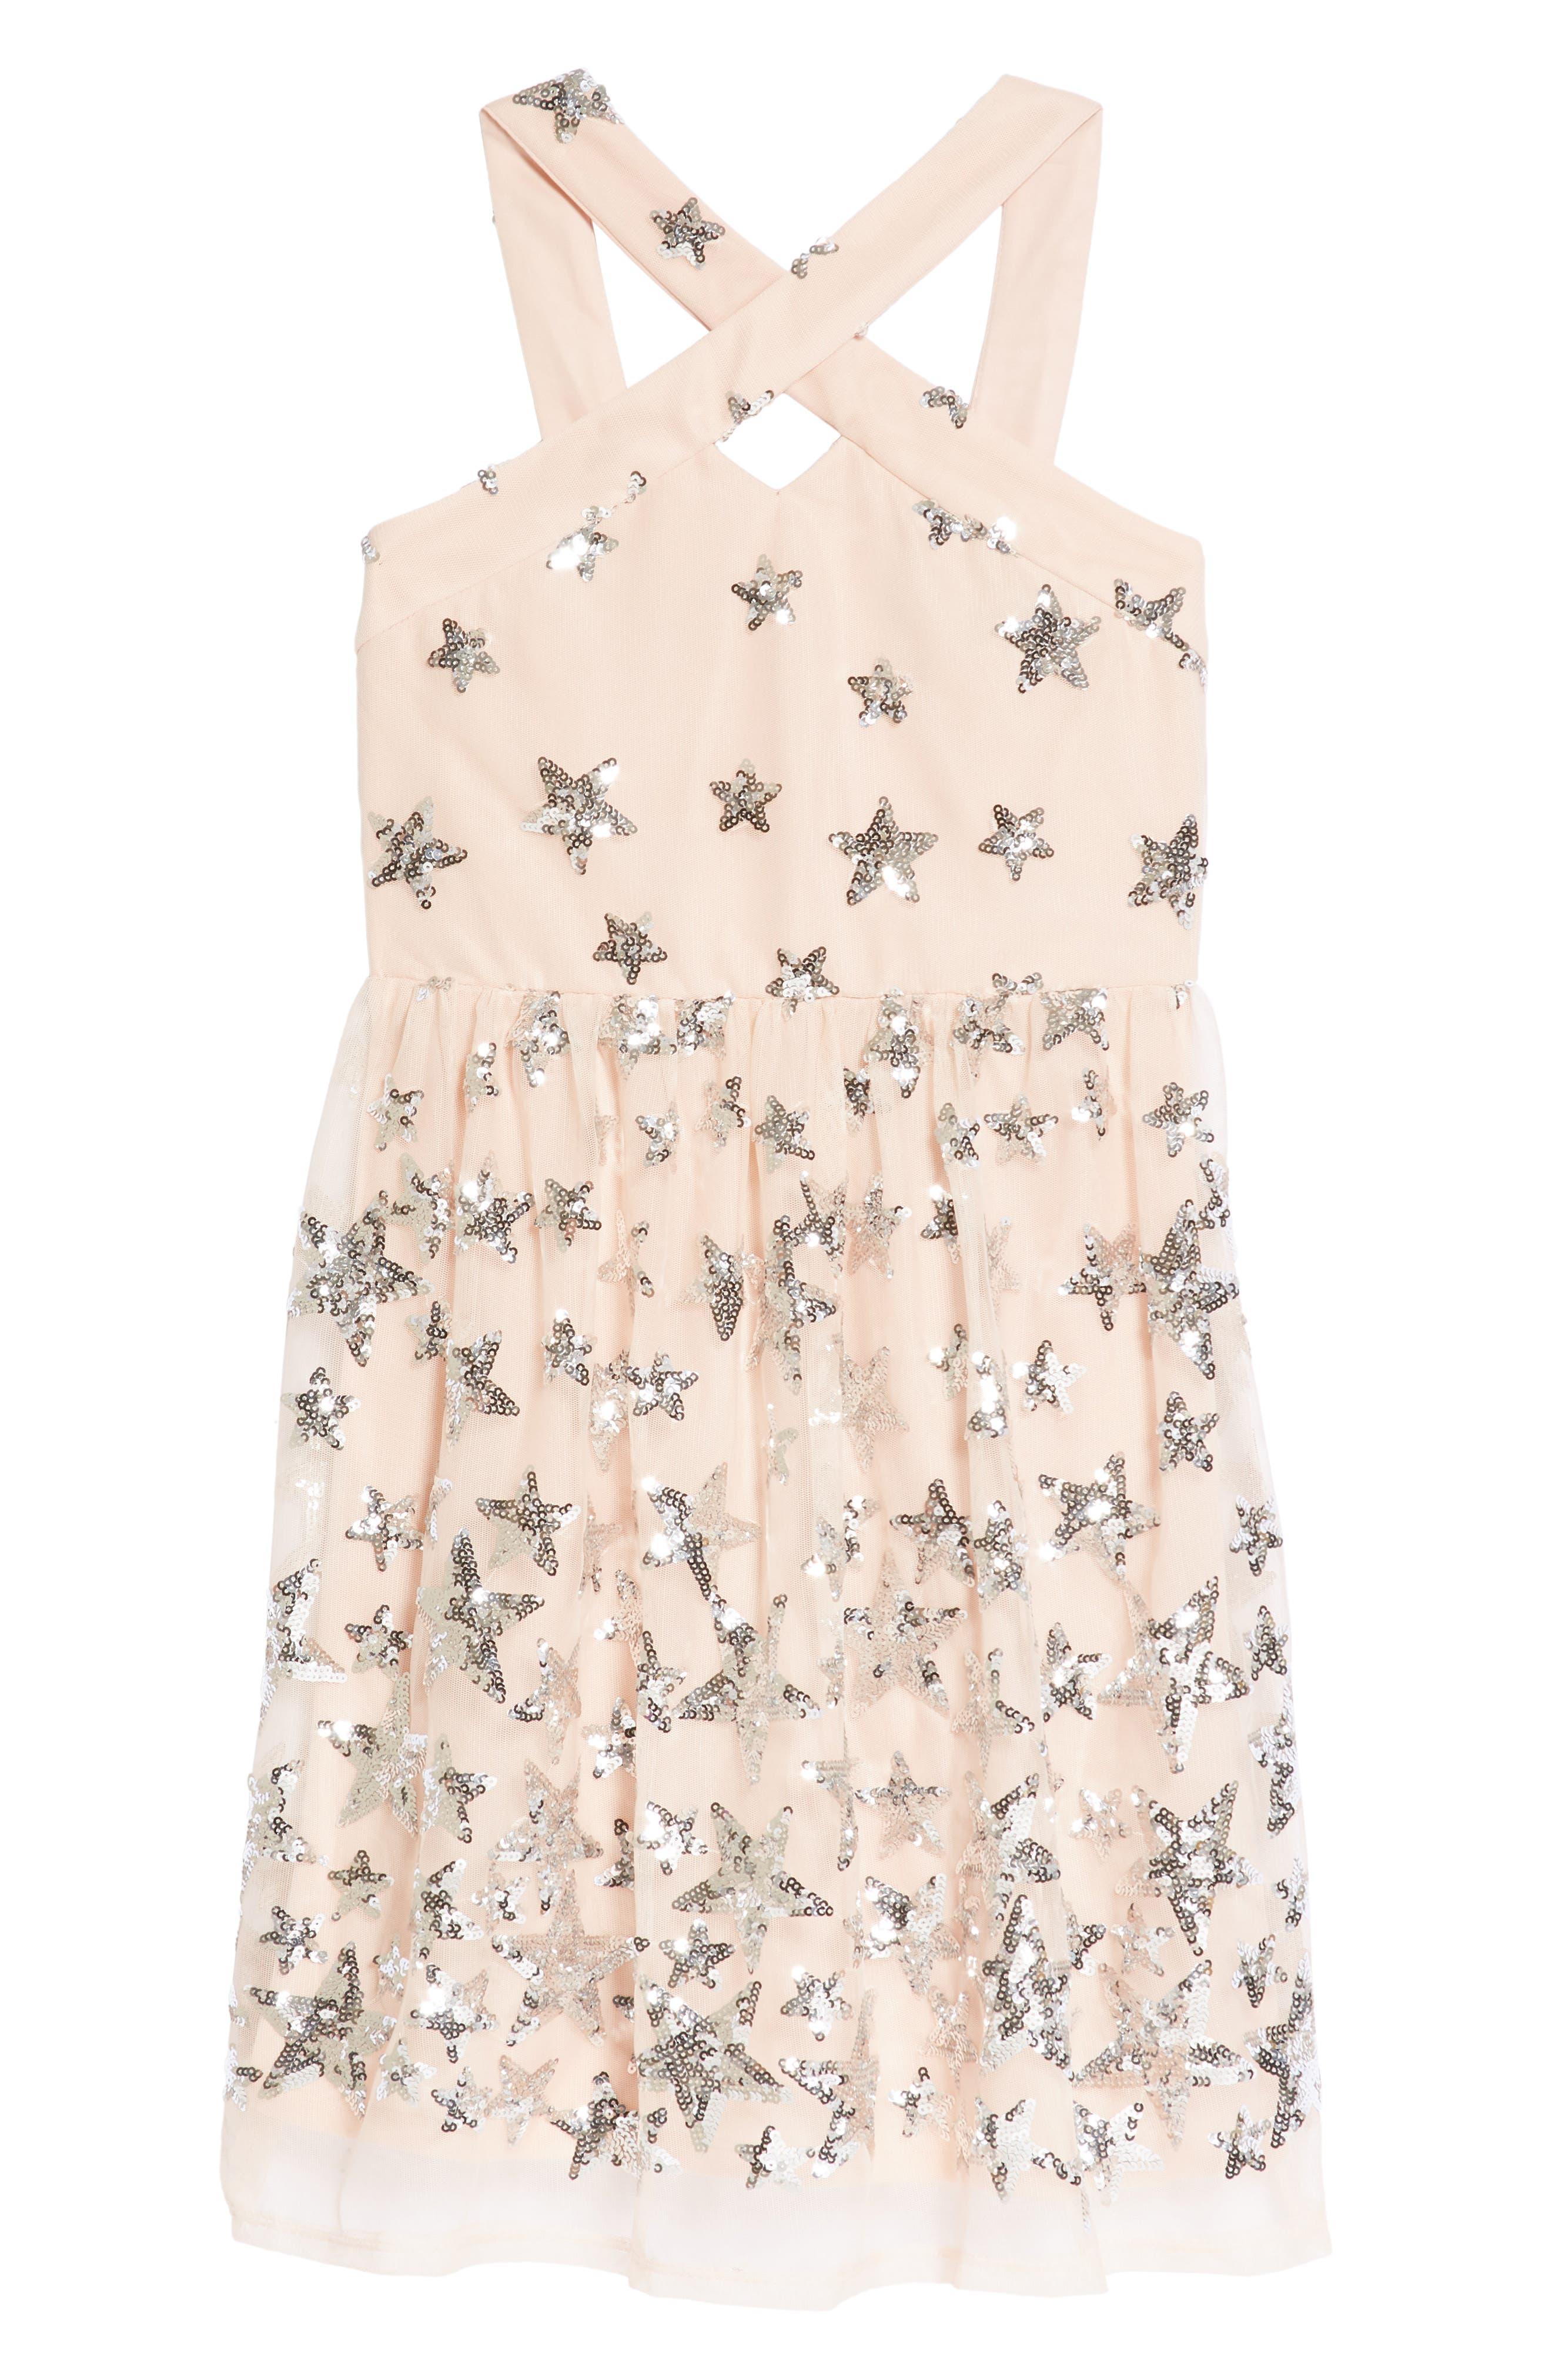 Sequin Embellished Star Party Dress,                         Main,                         color, Blush